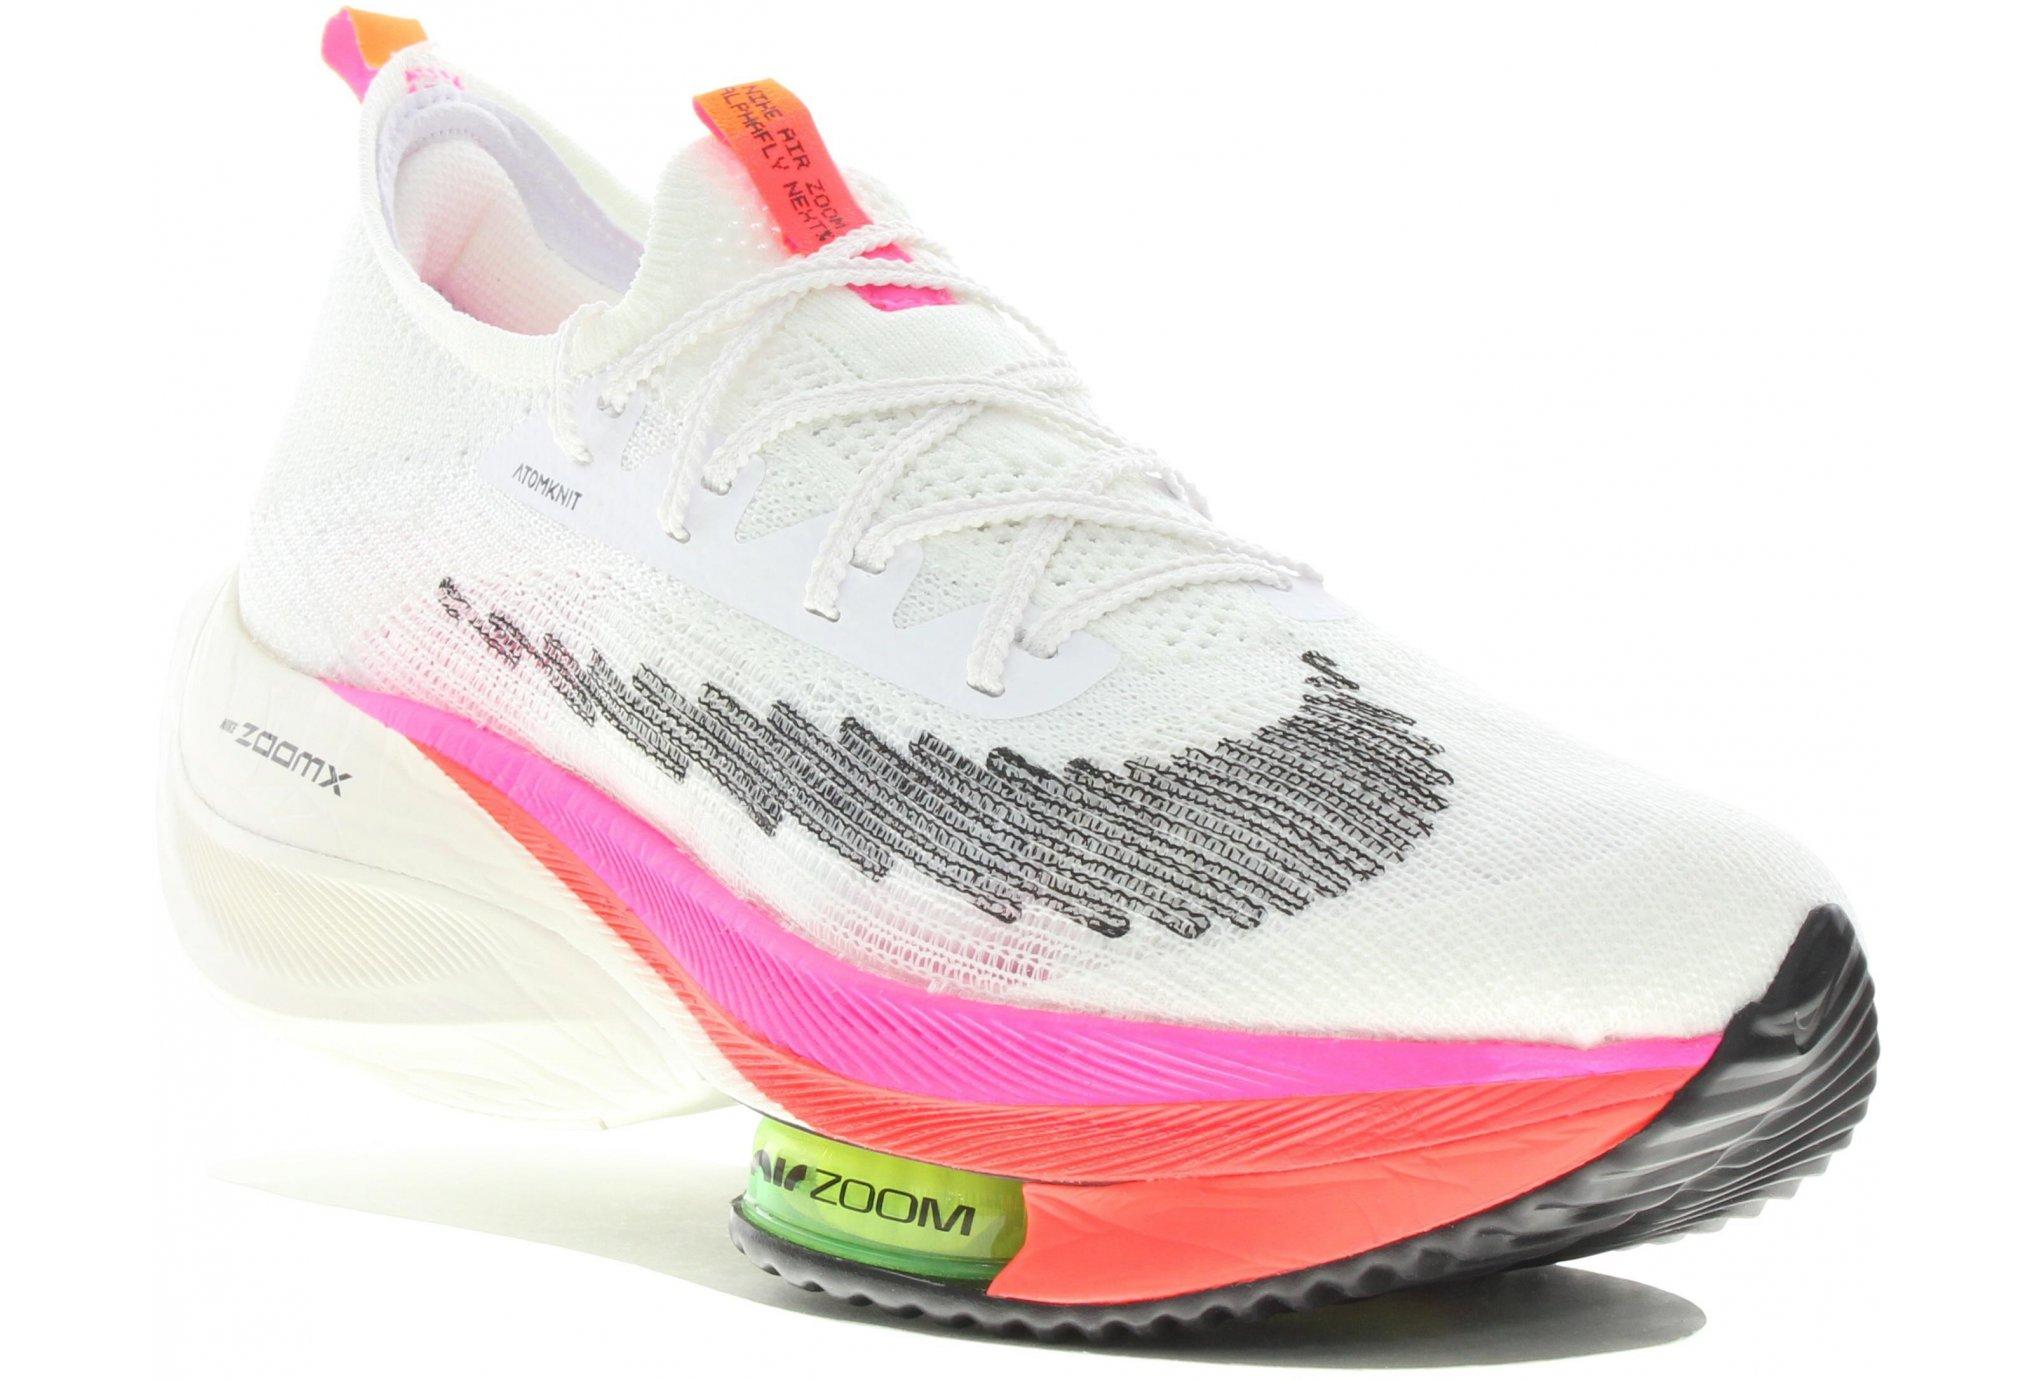 Nike Air Zoom Alphafly Next% Rawdacious W Chaussures running femme